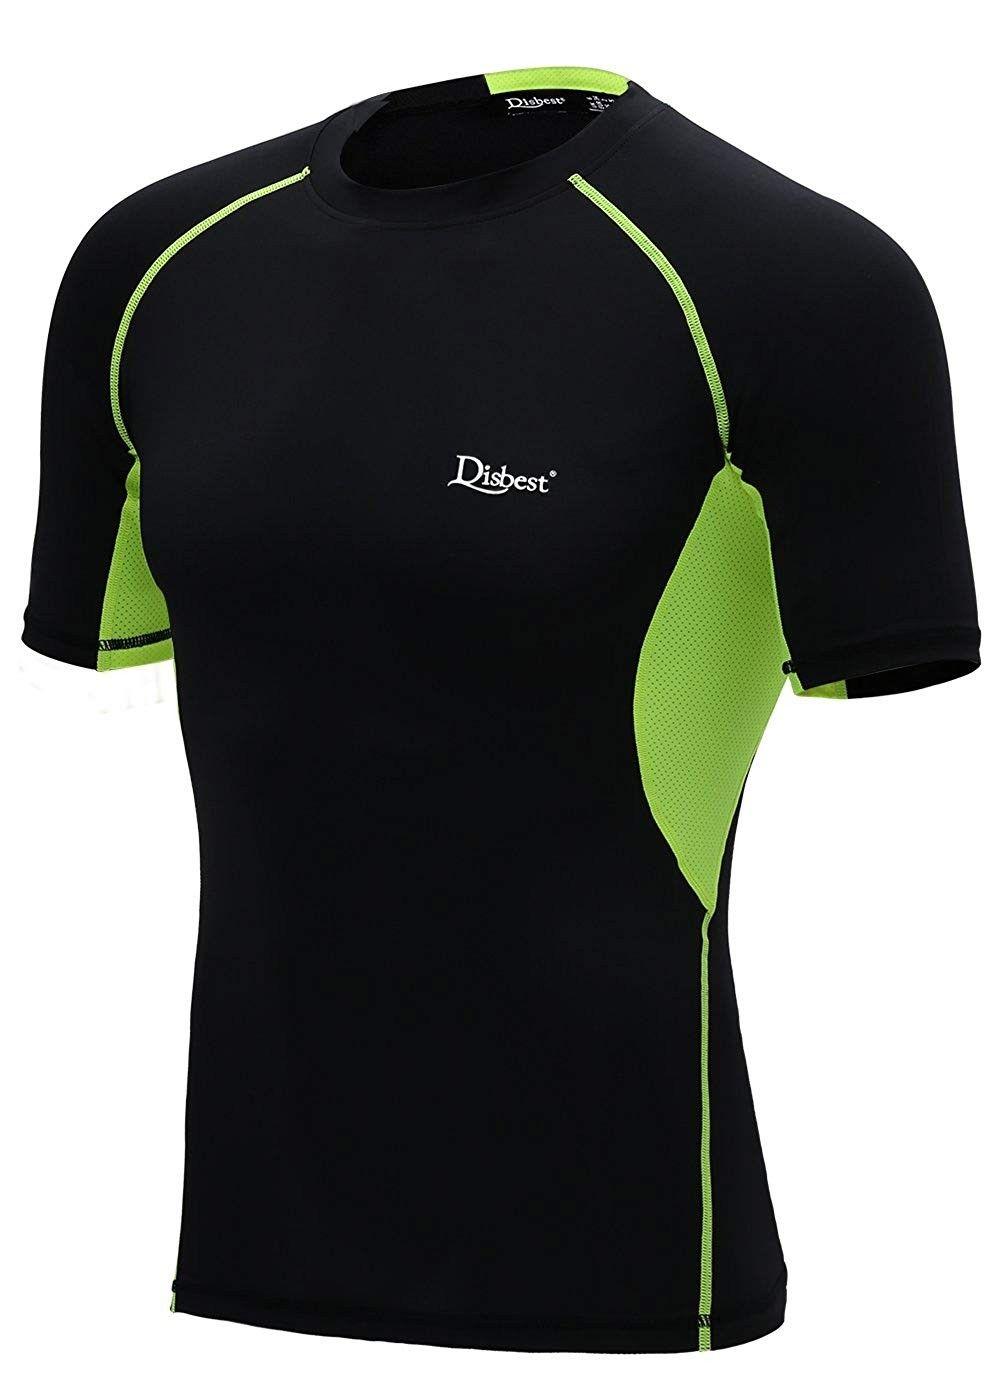 Men's Sport T Shirt Quick Dry Short Sleeves Performance